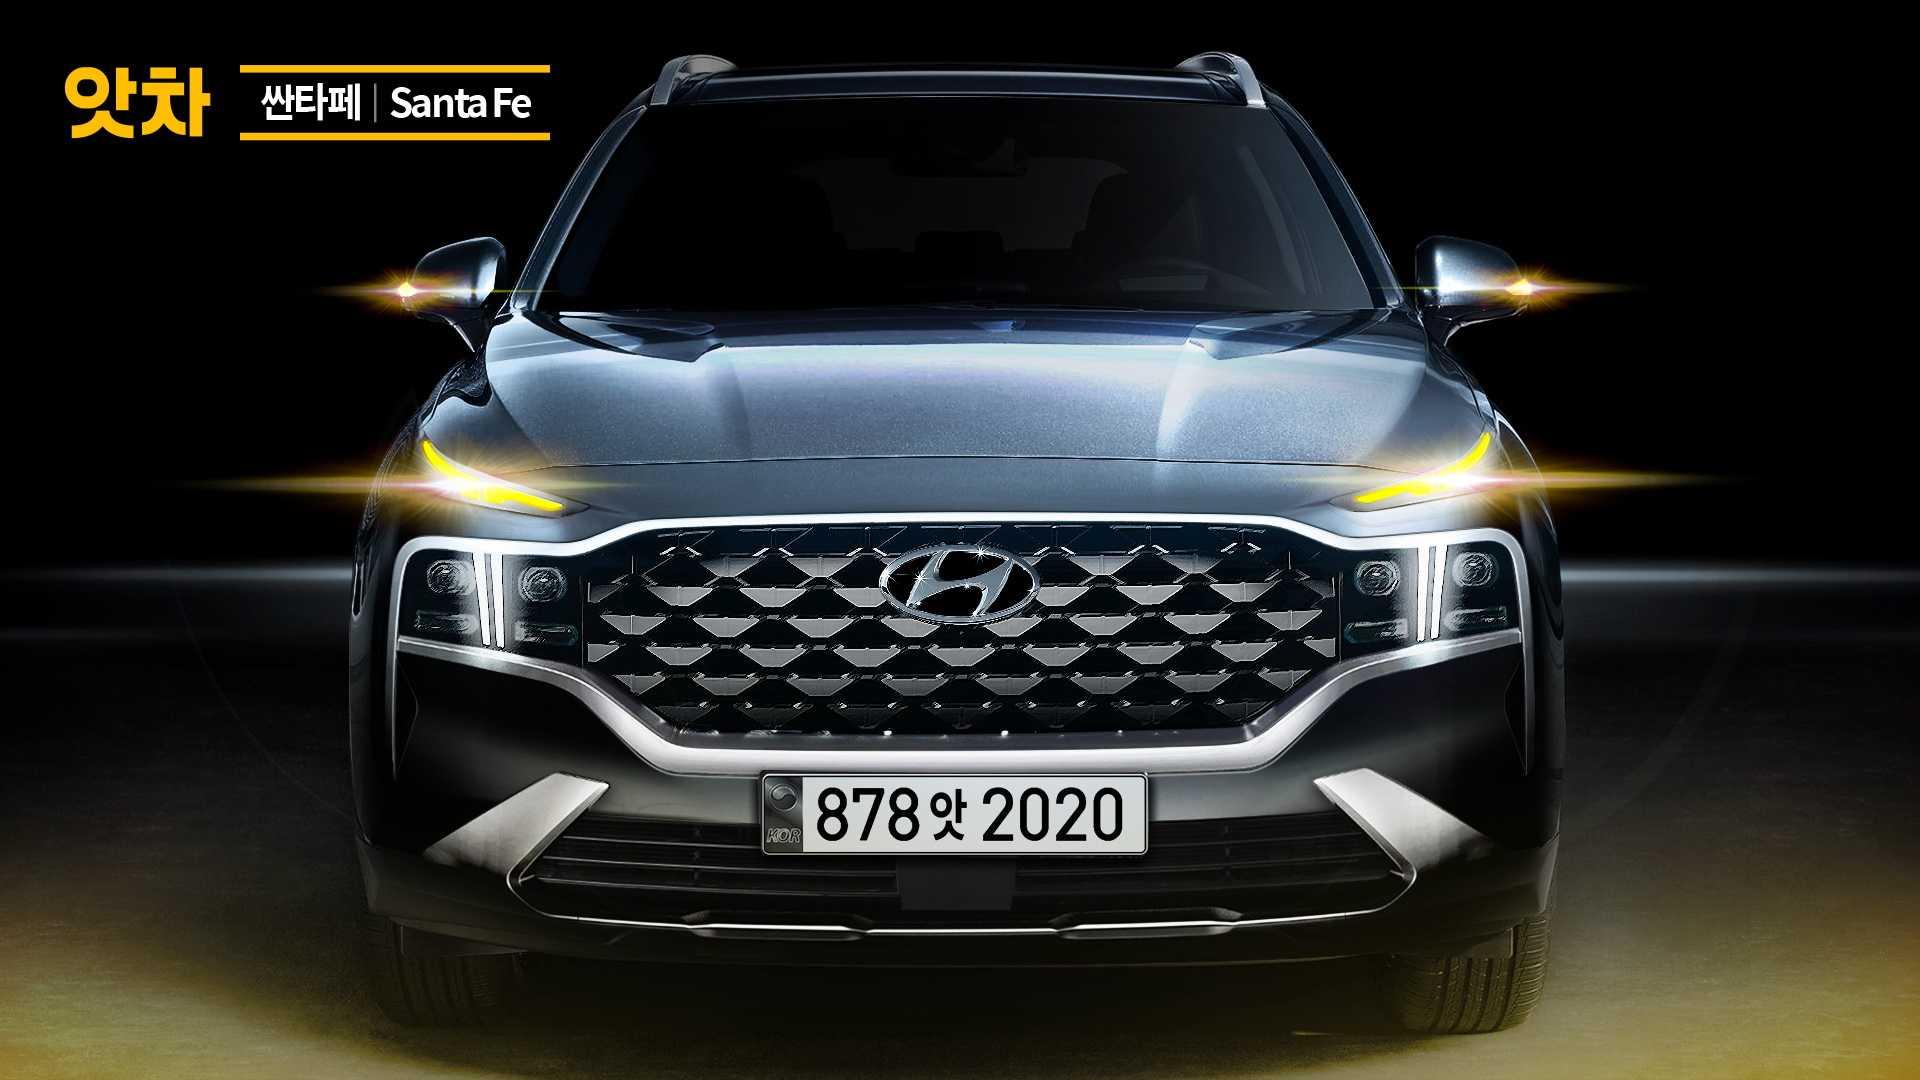 Hyundai_Santa_Fe_rendering_0010